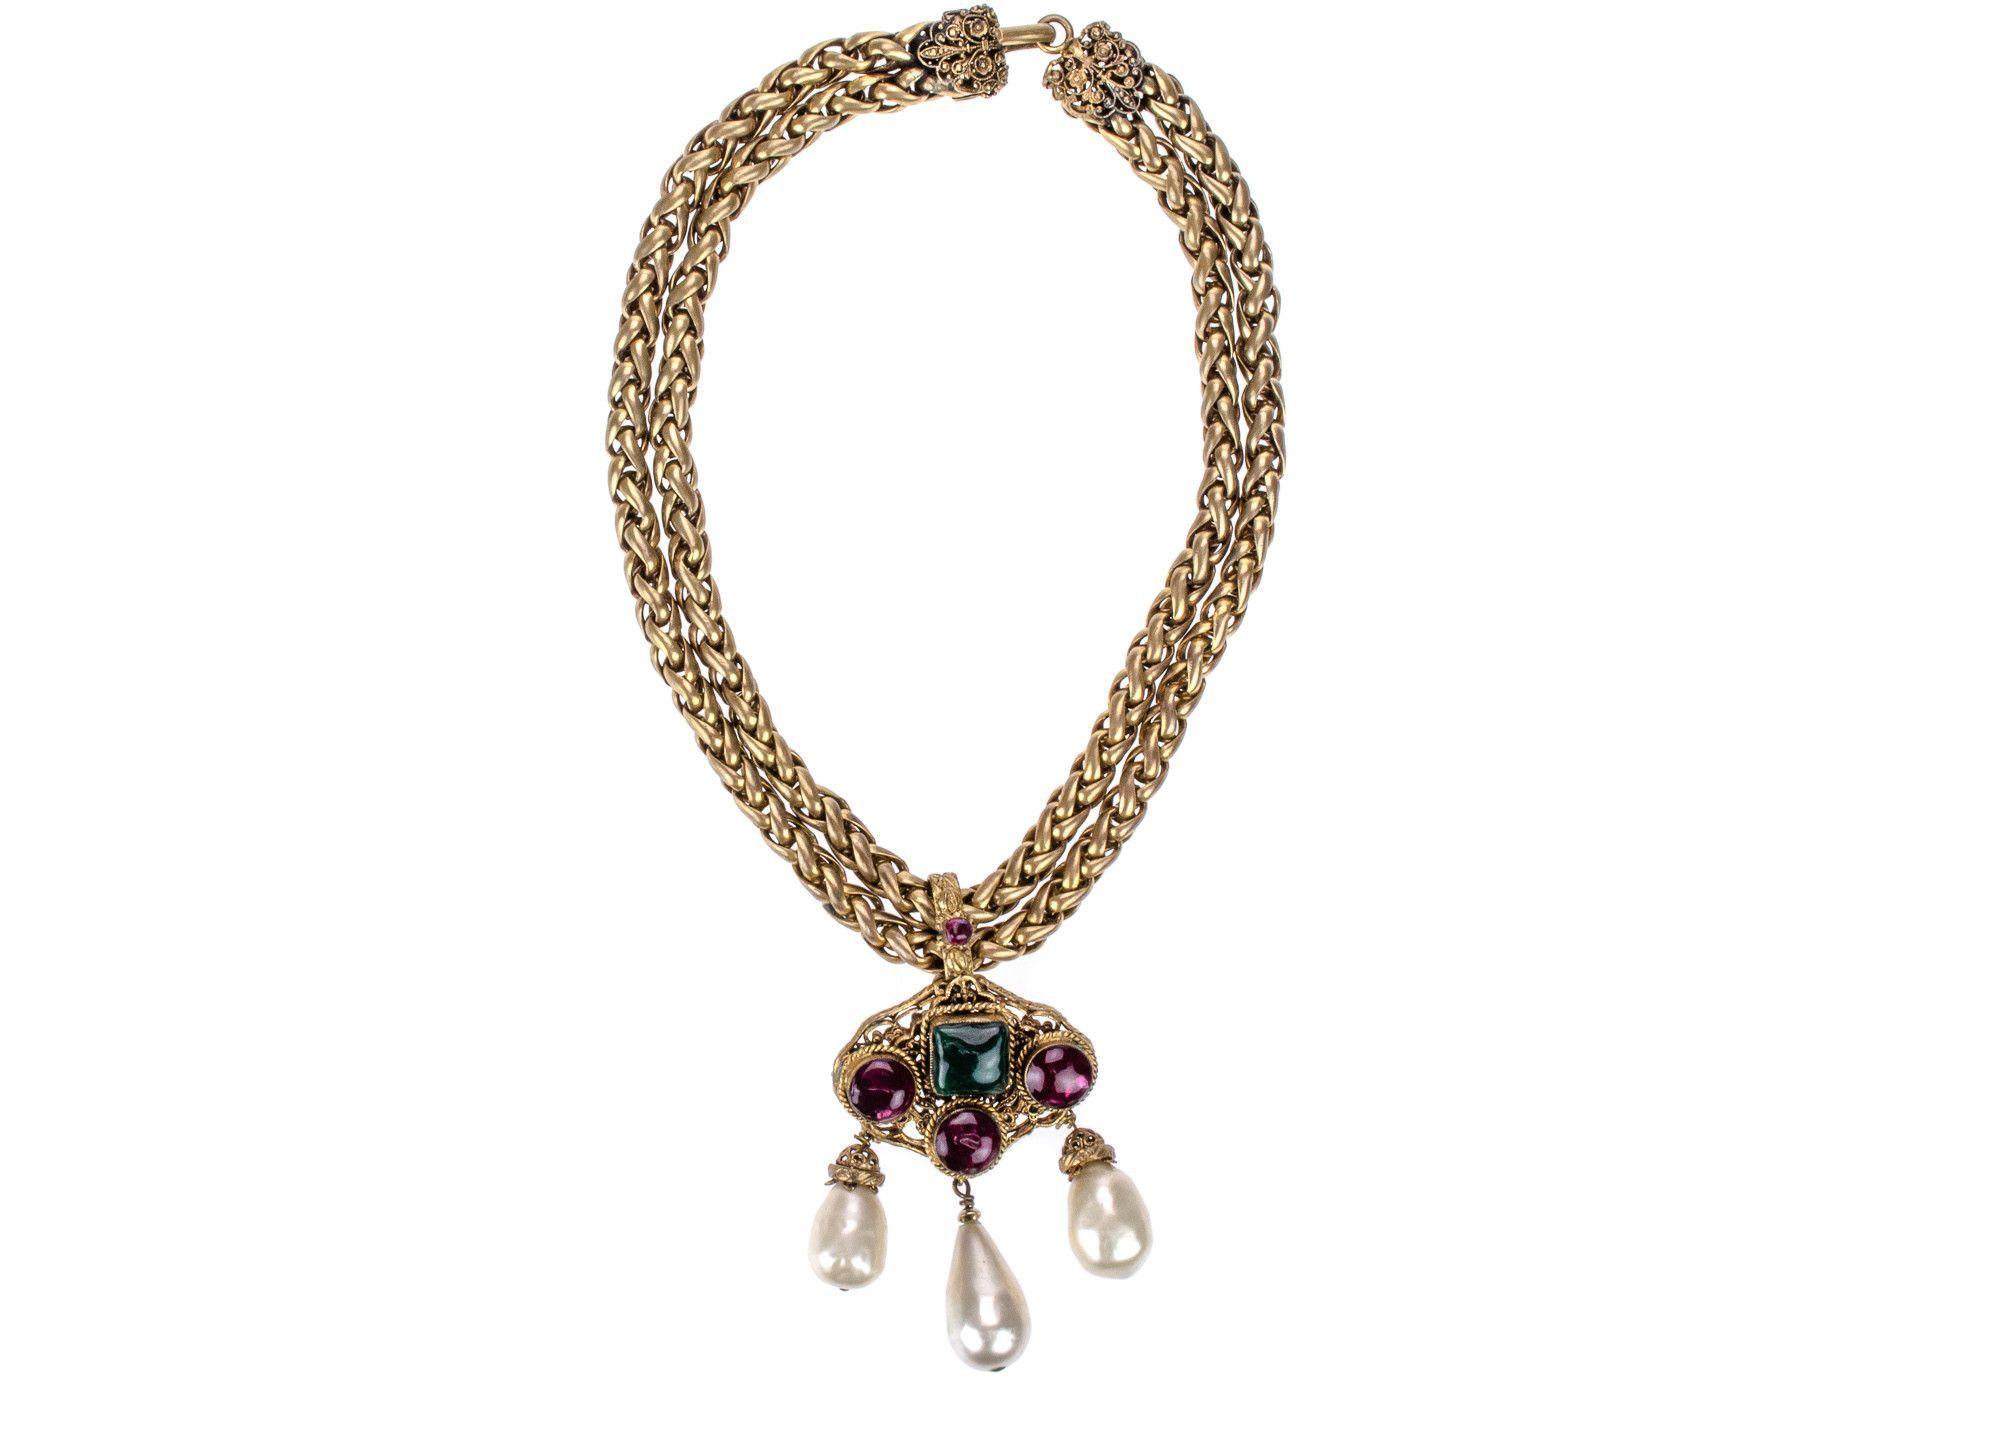 Chanel Early Vintage Gripoix Faux Pearl Necklace | Designer Vault